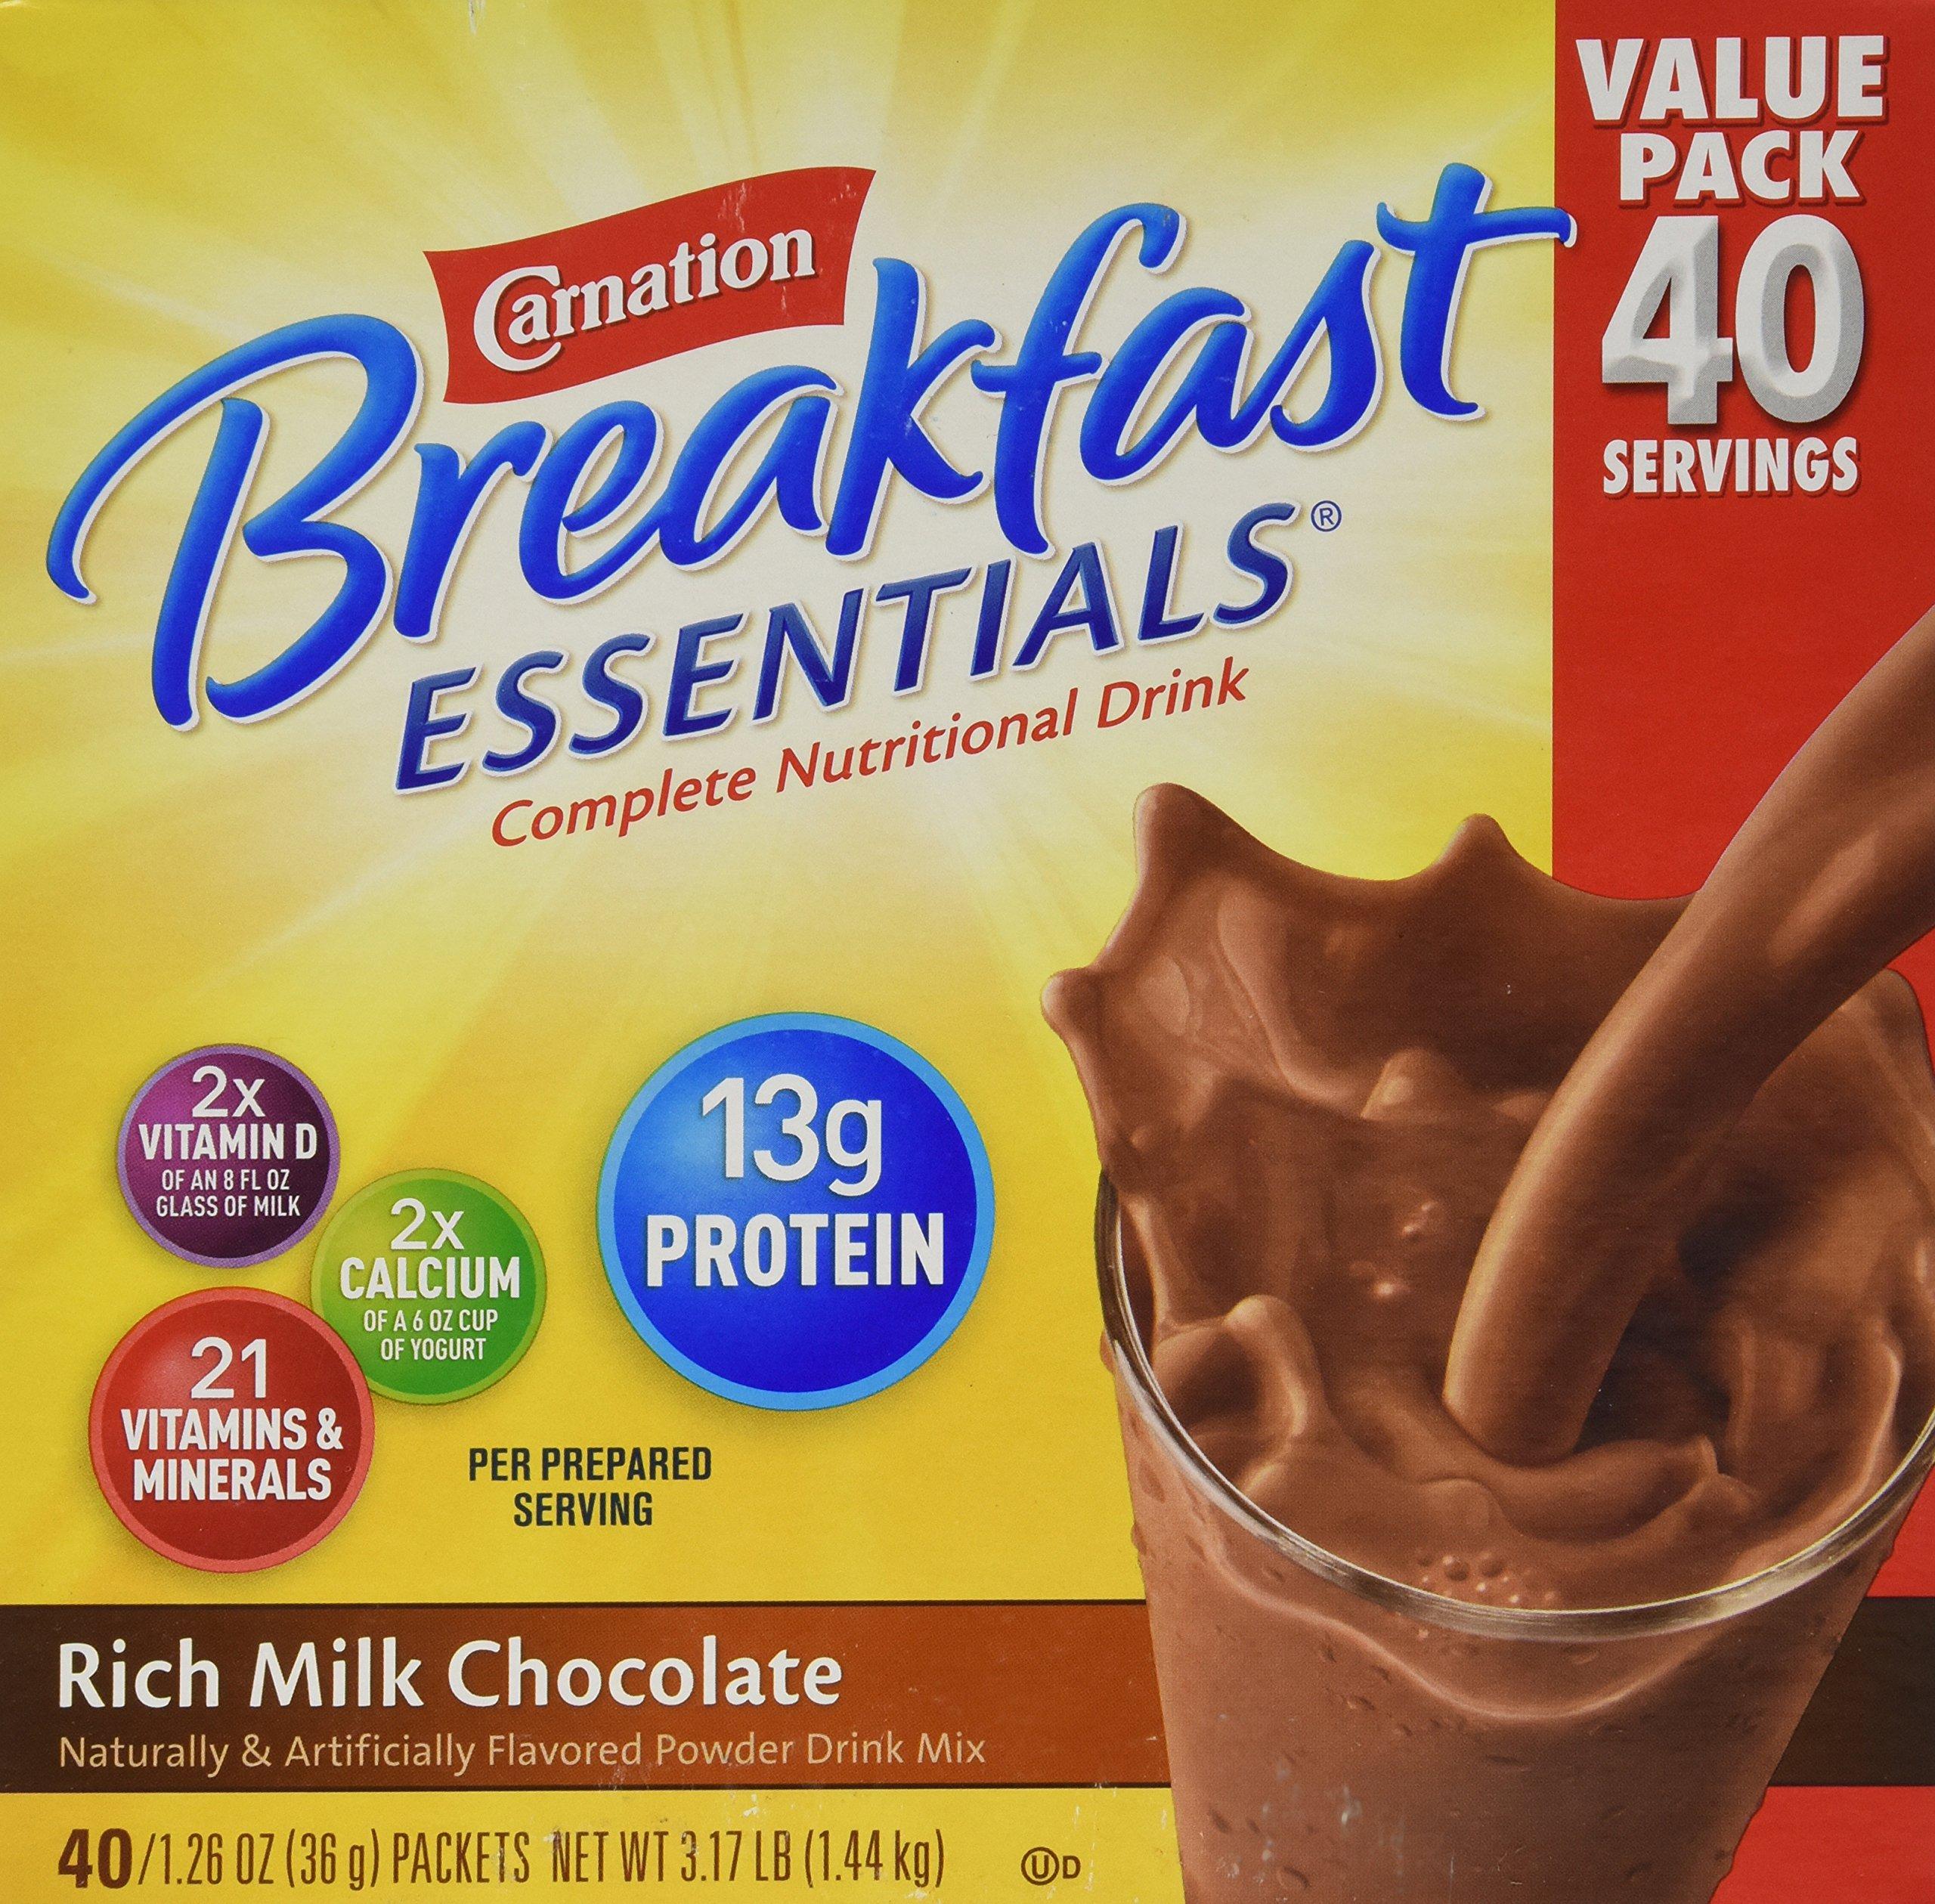 Carnation Breakfast Essentials 40-1.26oz Packets - Rich Milk Chocolate by Carnation (Image #1)